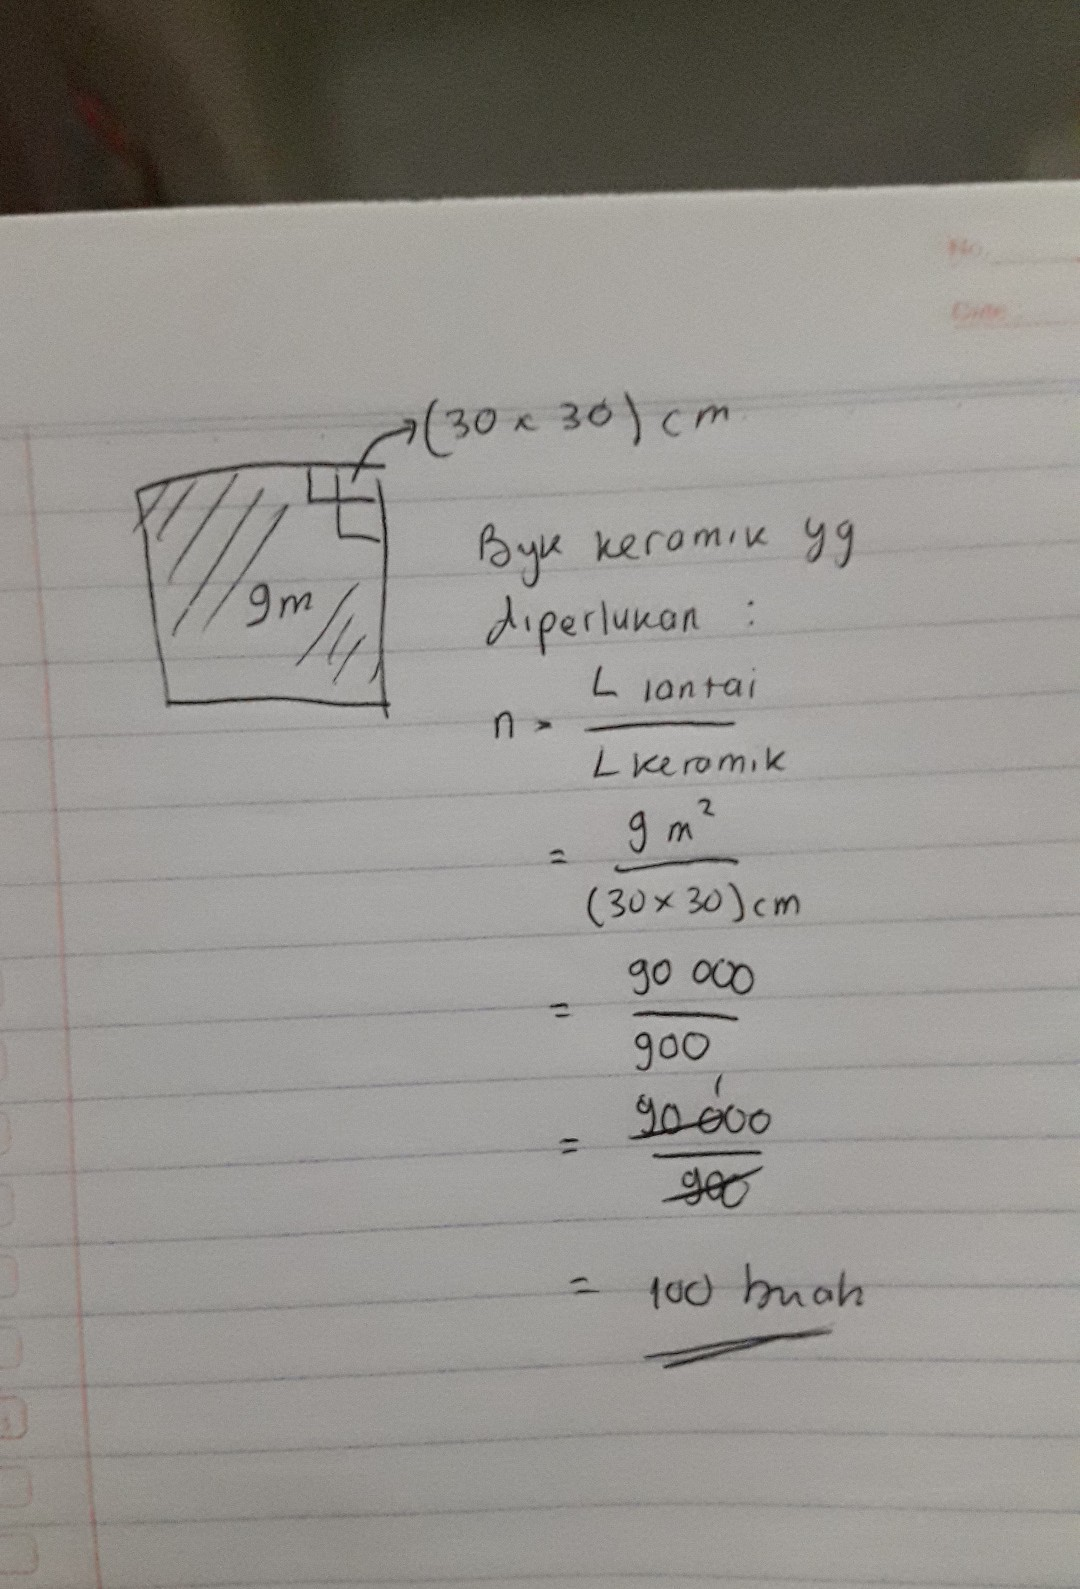 1 Are Berapa Meter Persegi : berapa, meter, persegi, Berapa, Meter, Persegi, IlmuSosial.id